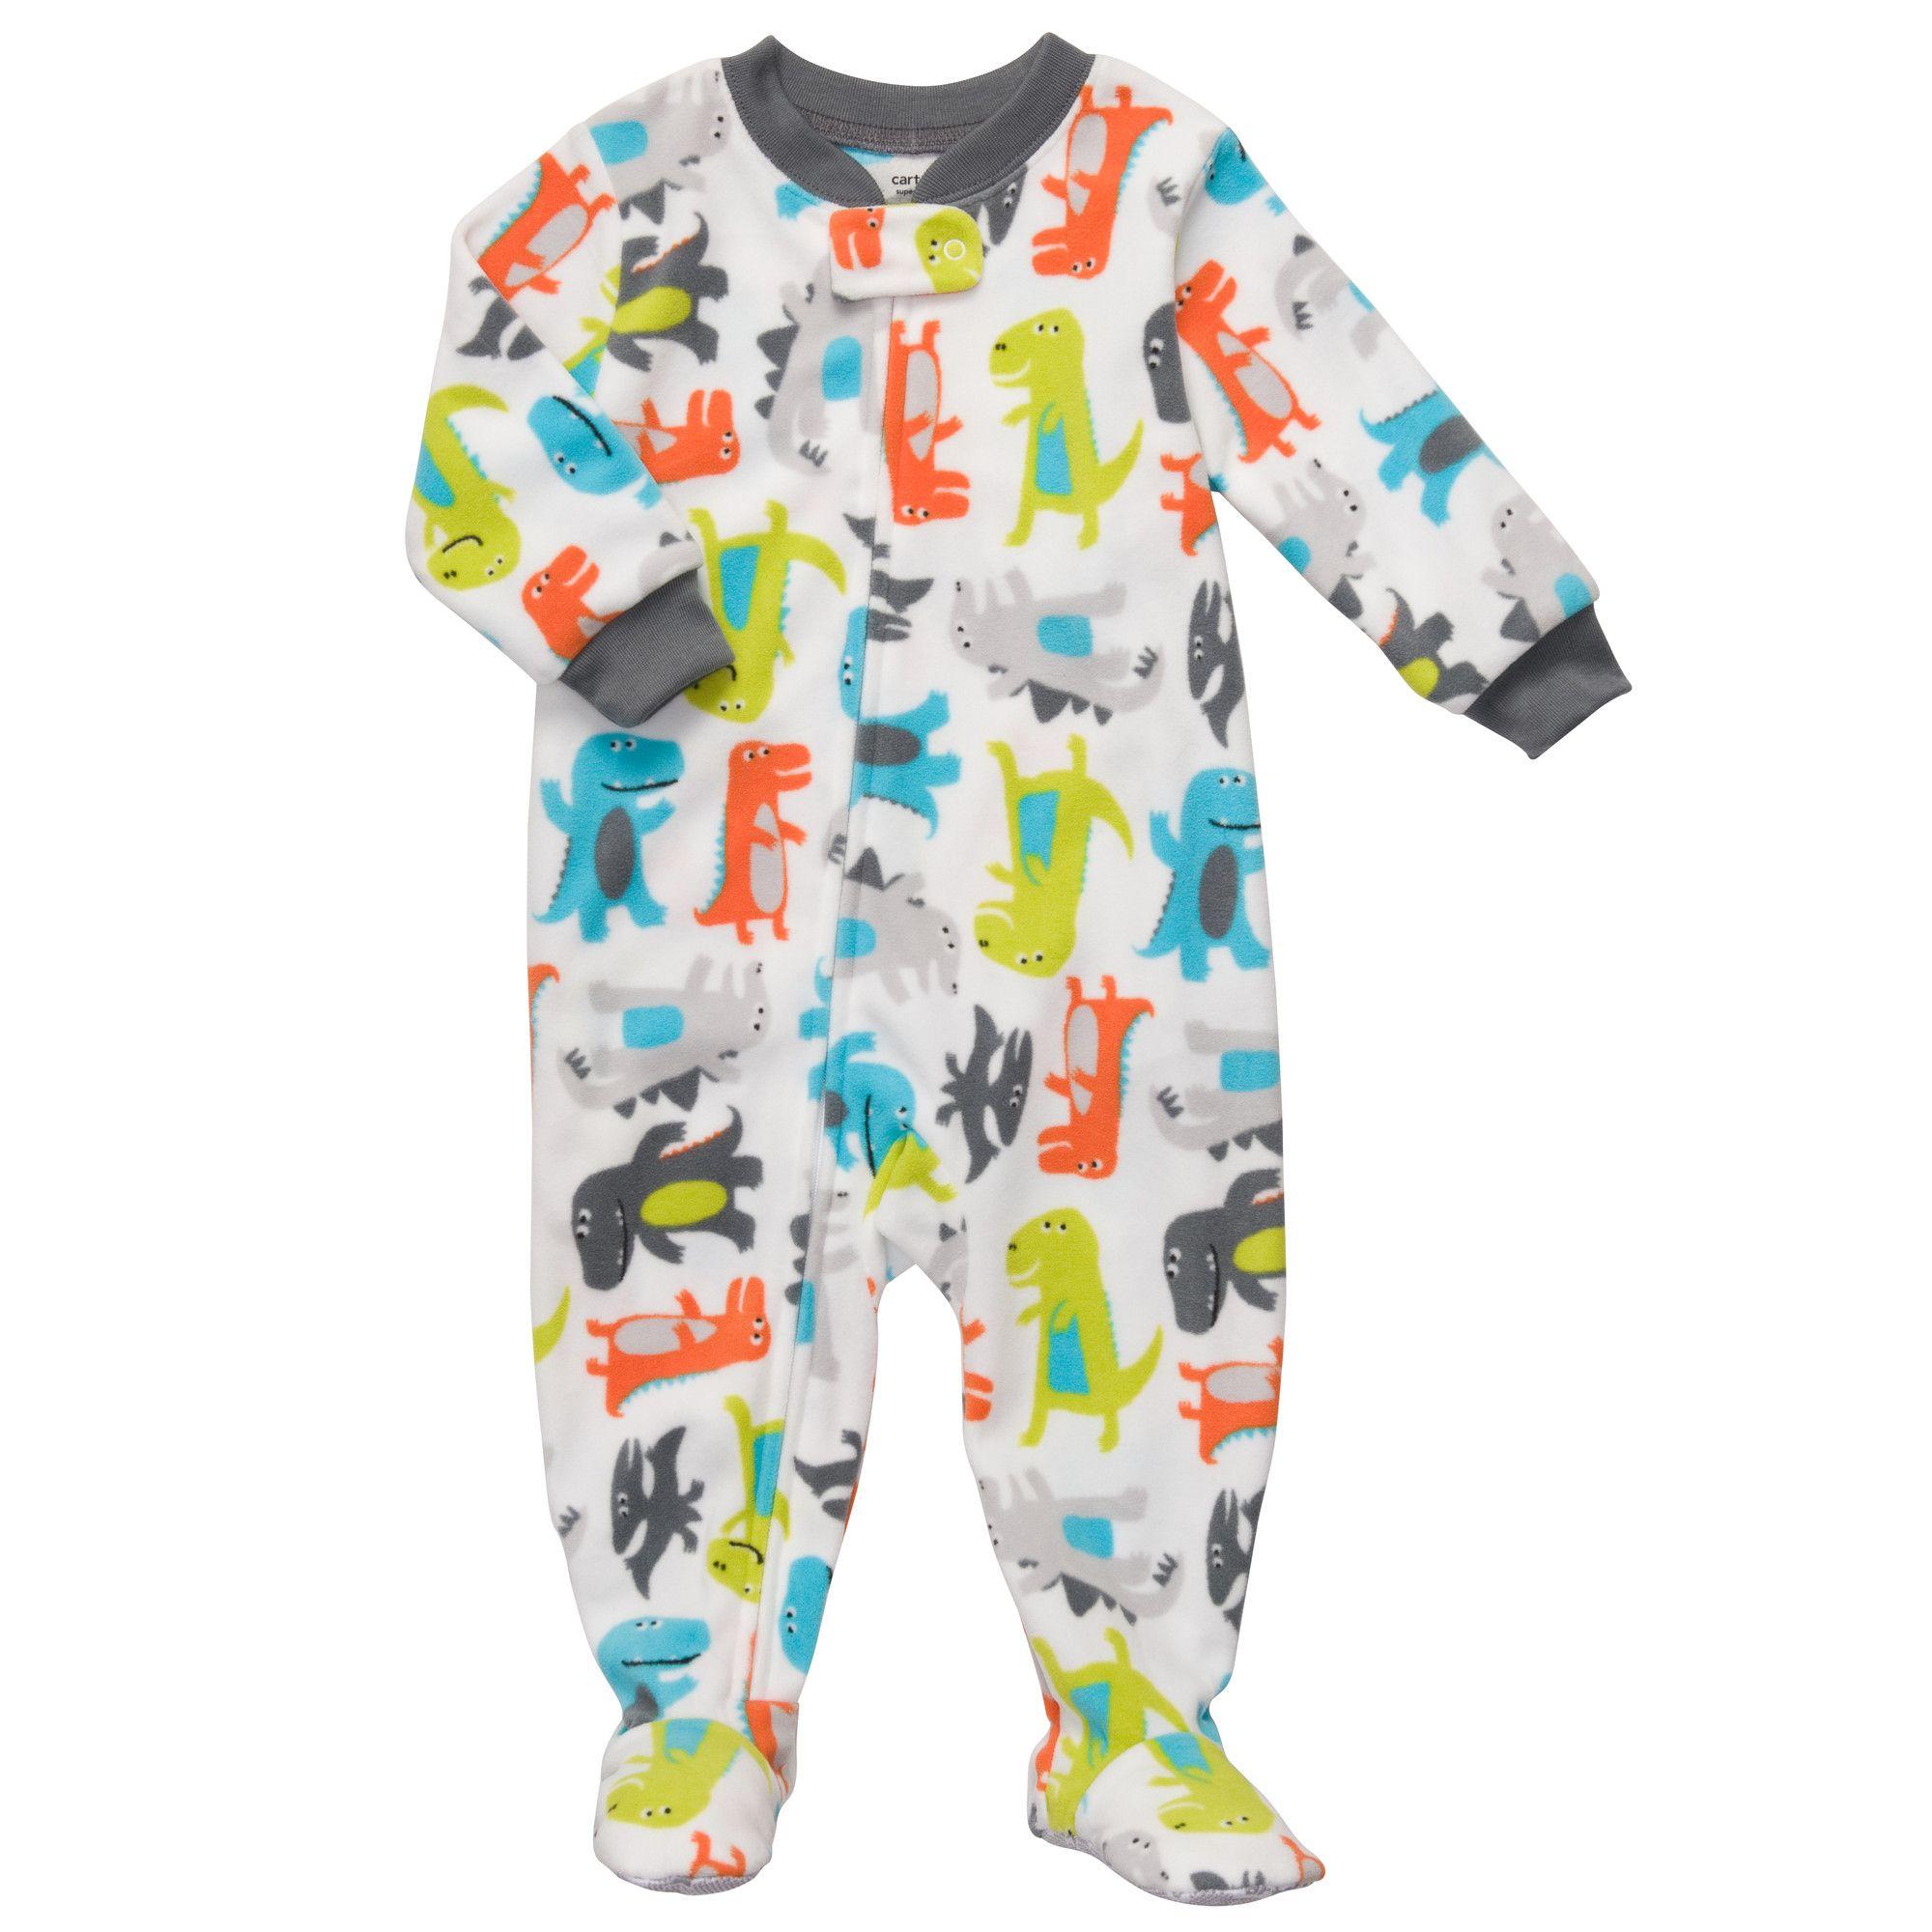 1-Piece Microfleece Pjs | Baby Boy Pajamas | Baby 3.0 | Pinterest ...